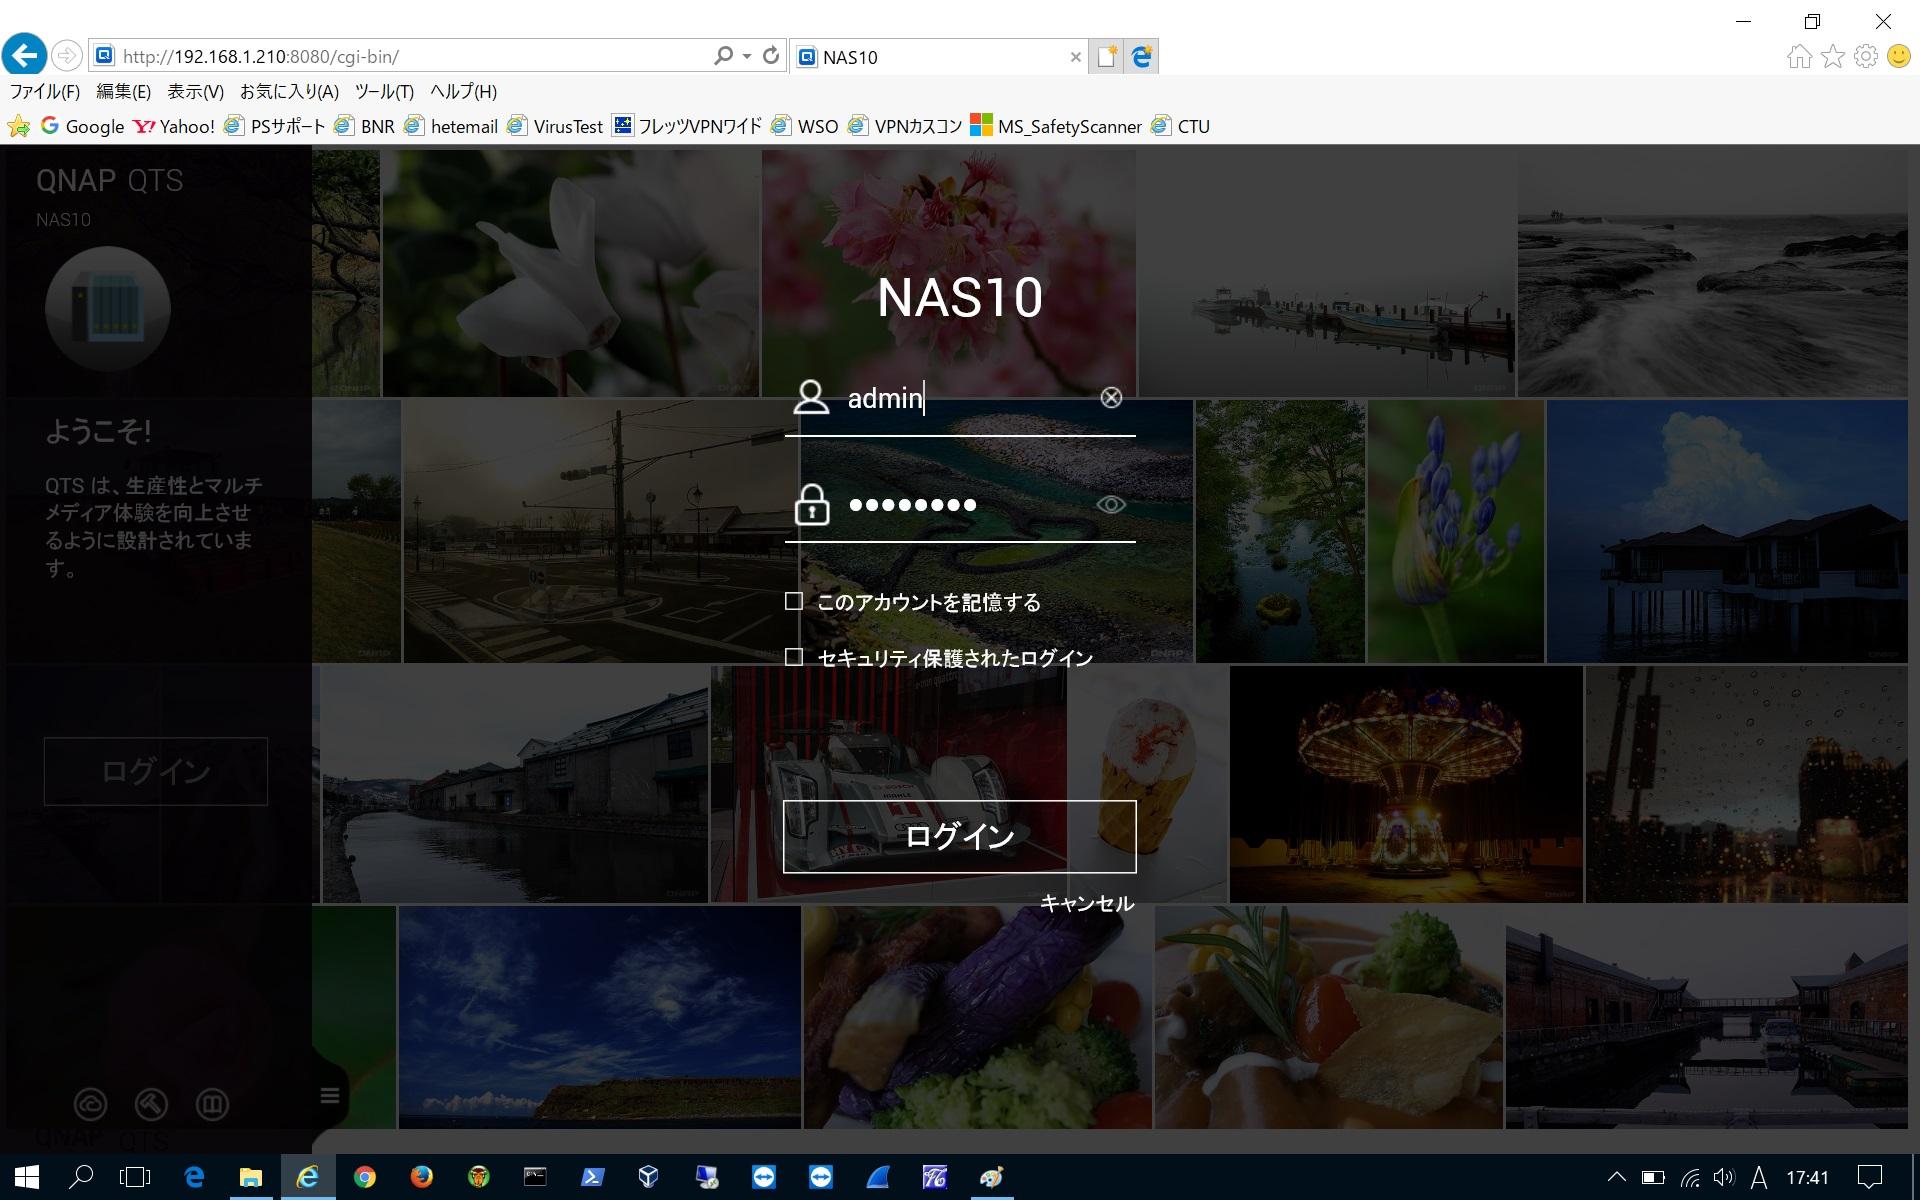 015 QNAP-NAS_install